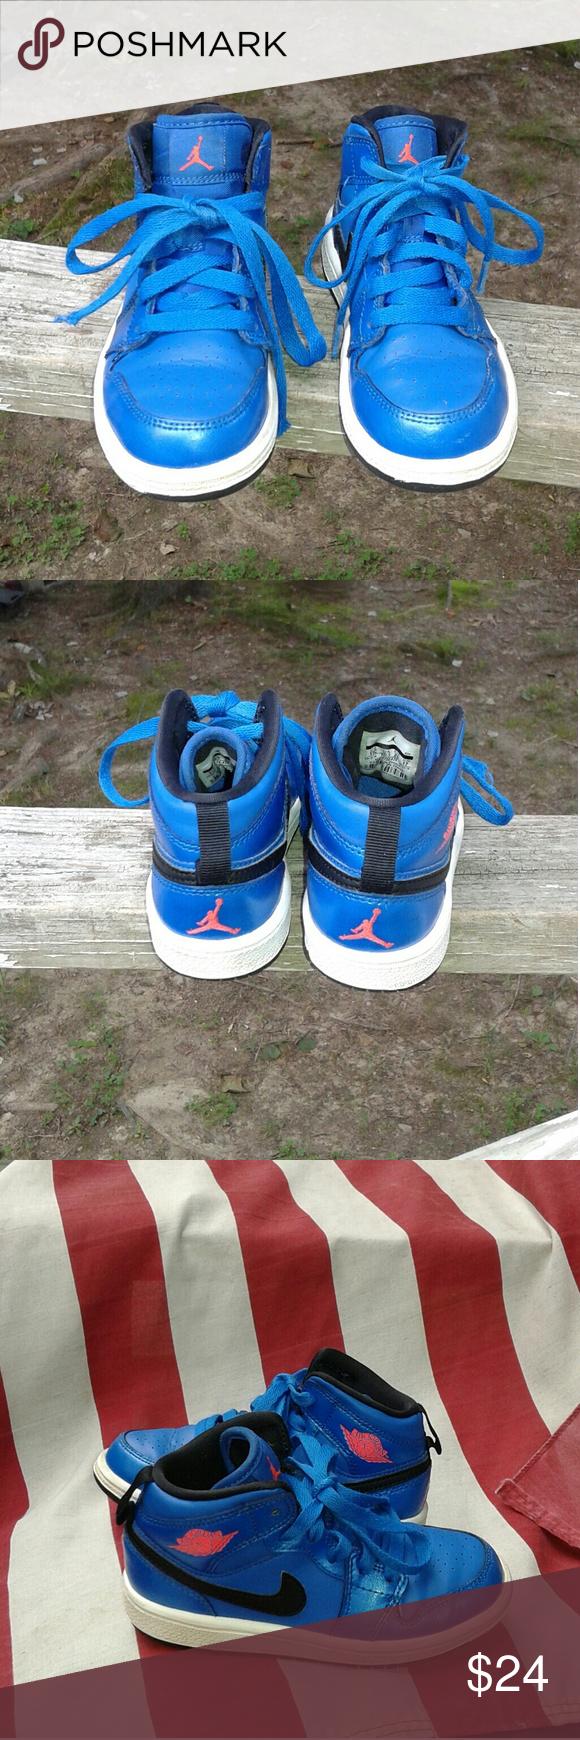 b99b7429869 Selling this Nike Air Jordan Toddler girls shoe s size 11c on Poshmark! My  username is  alicesales.  shopmycloset  poshmark  fashion  shopping  style  ...